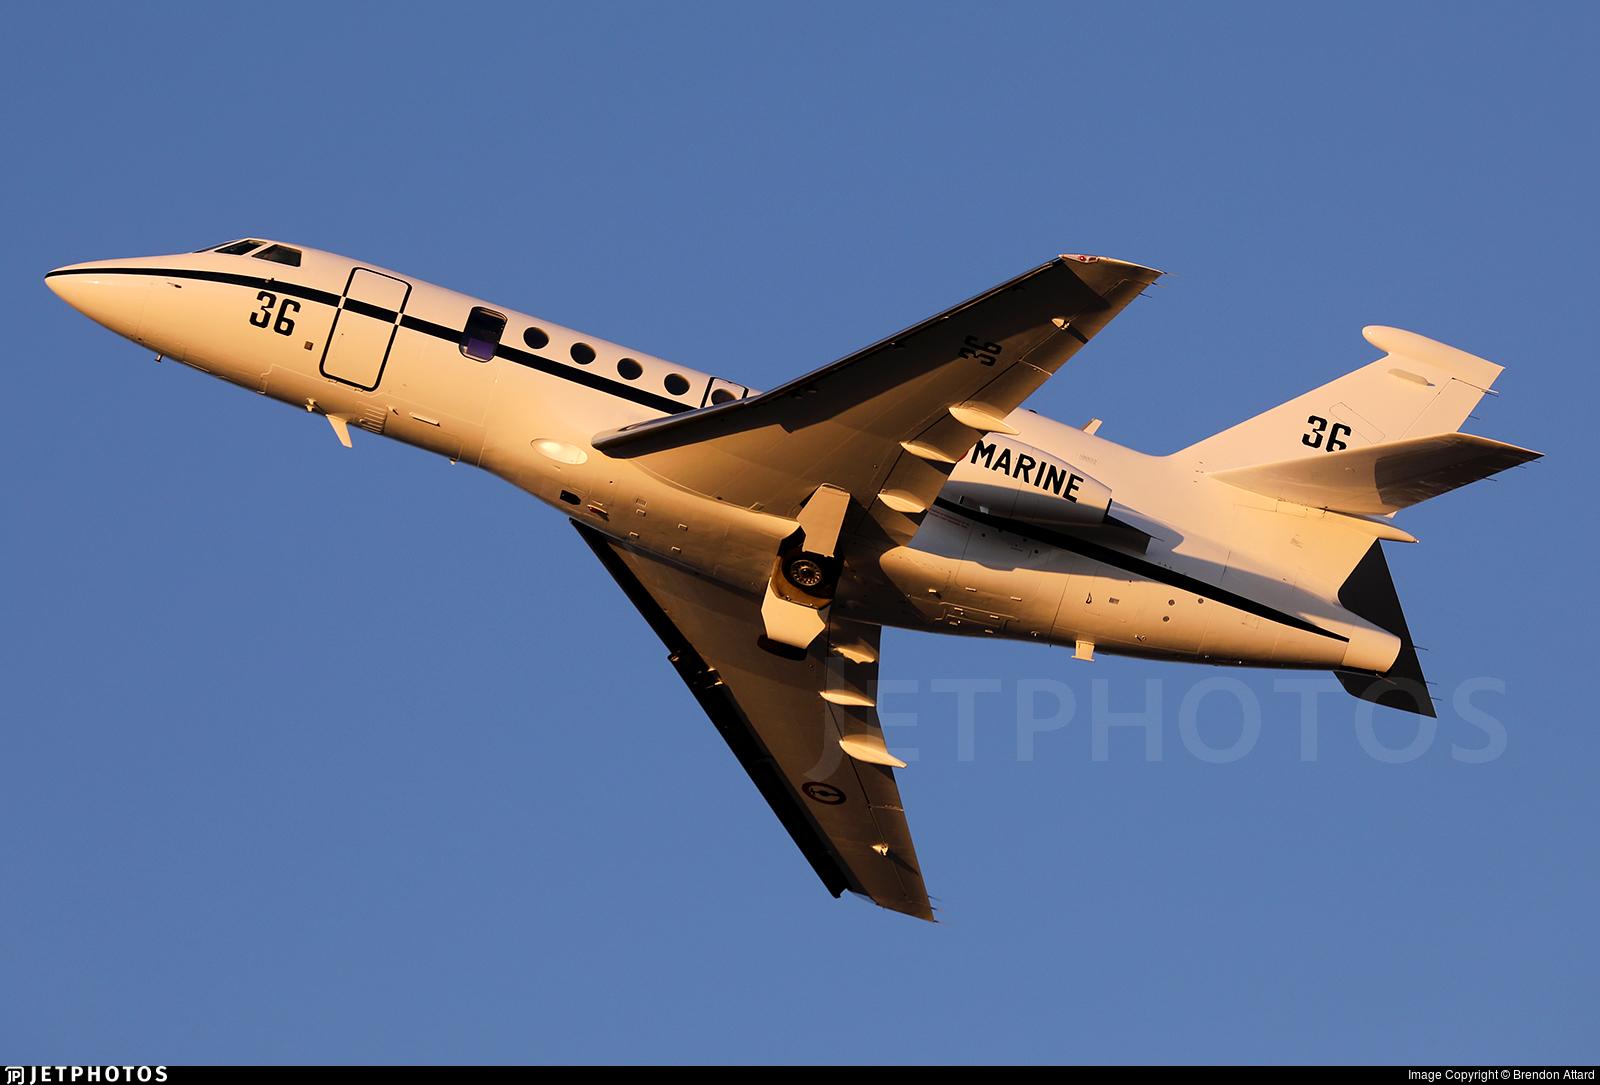 36 - Dassault Falcon 50M - France - Navy